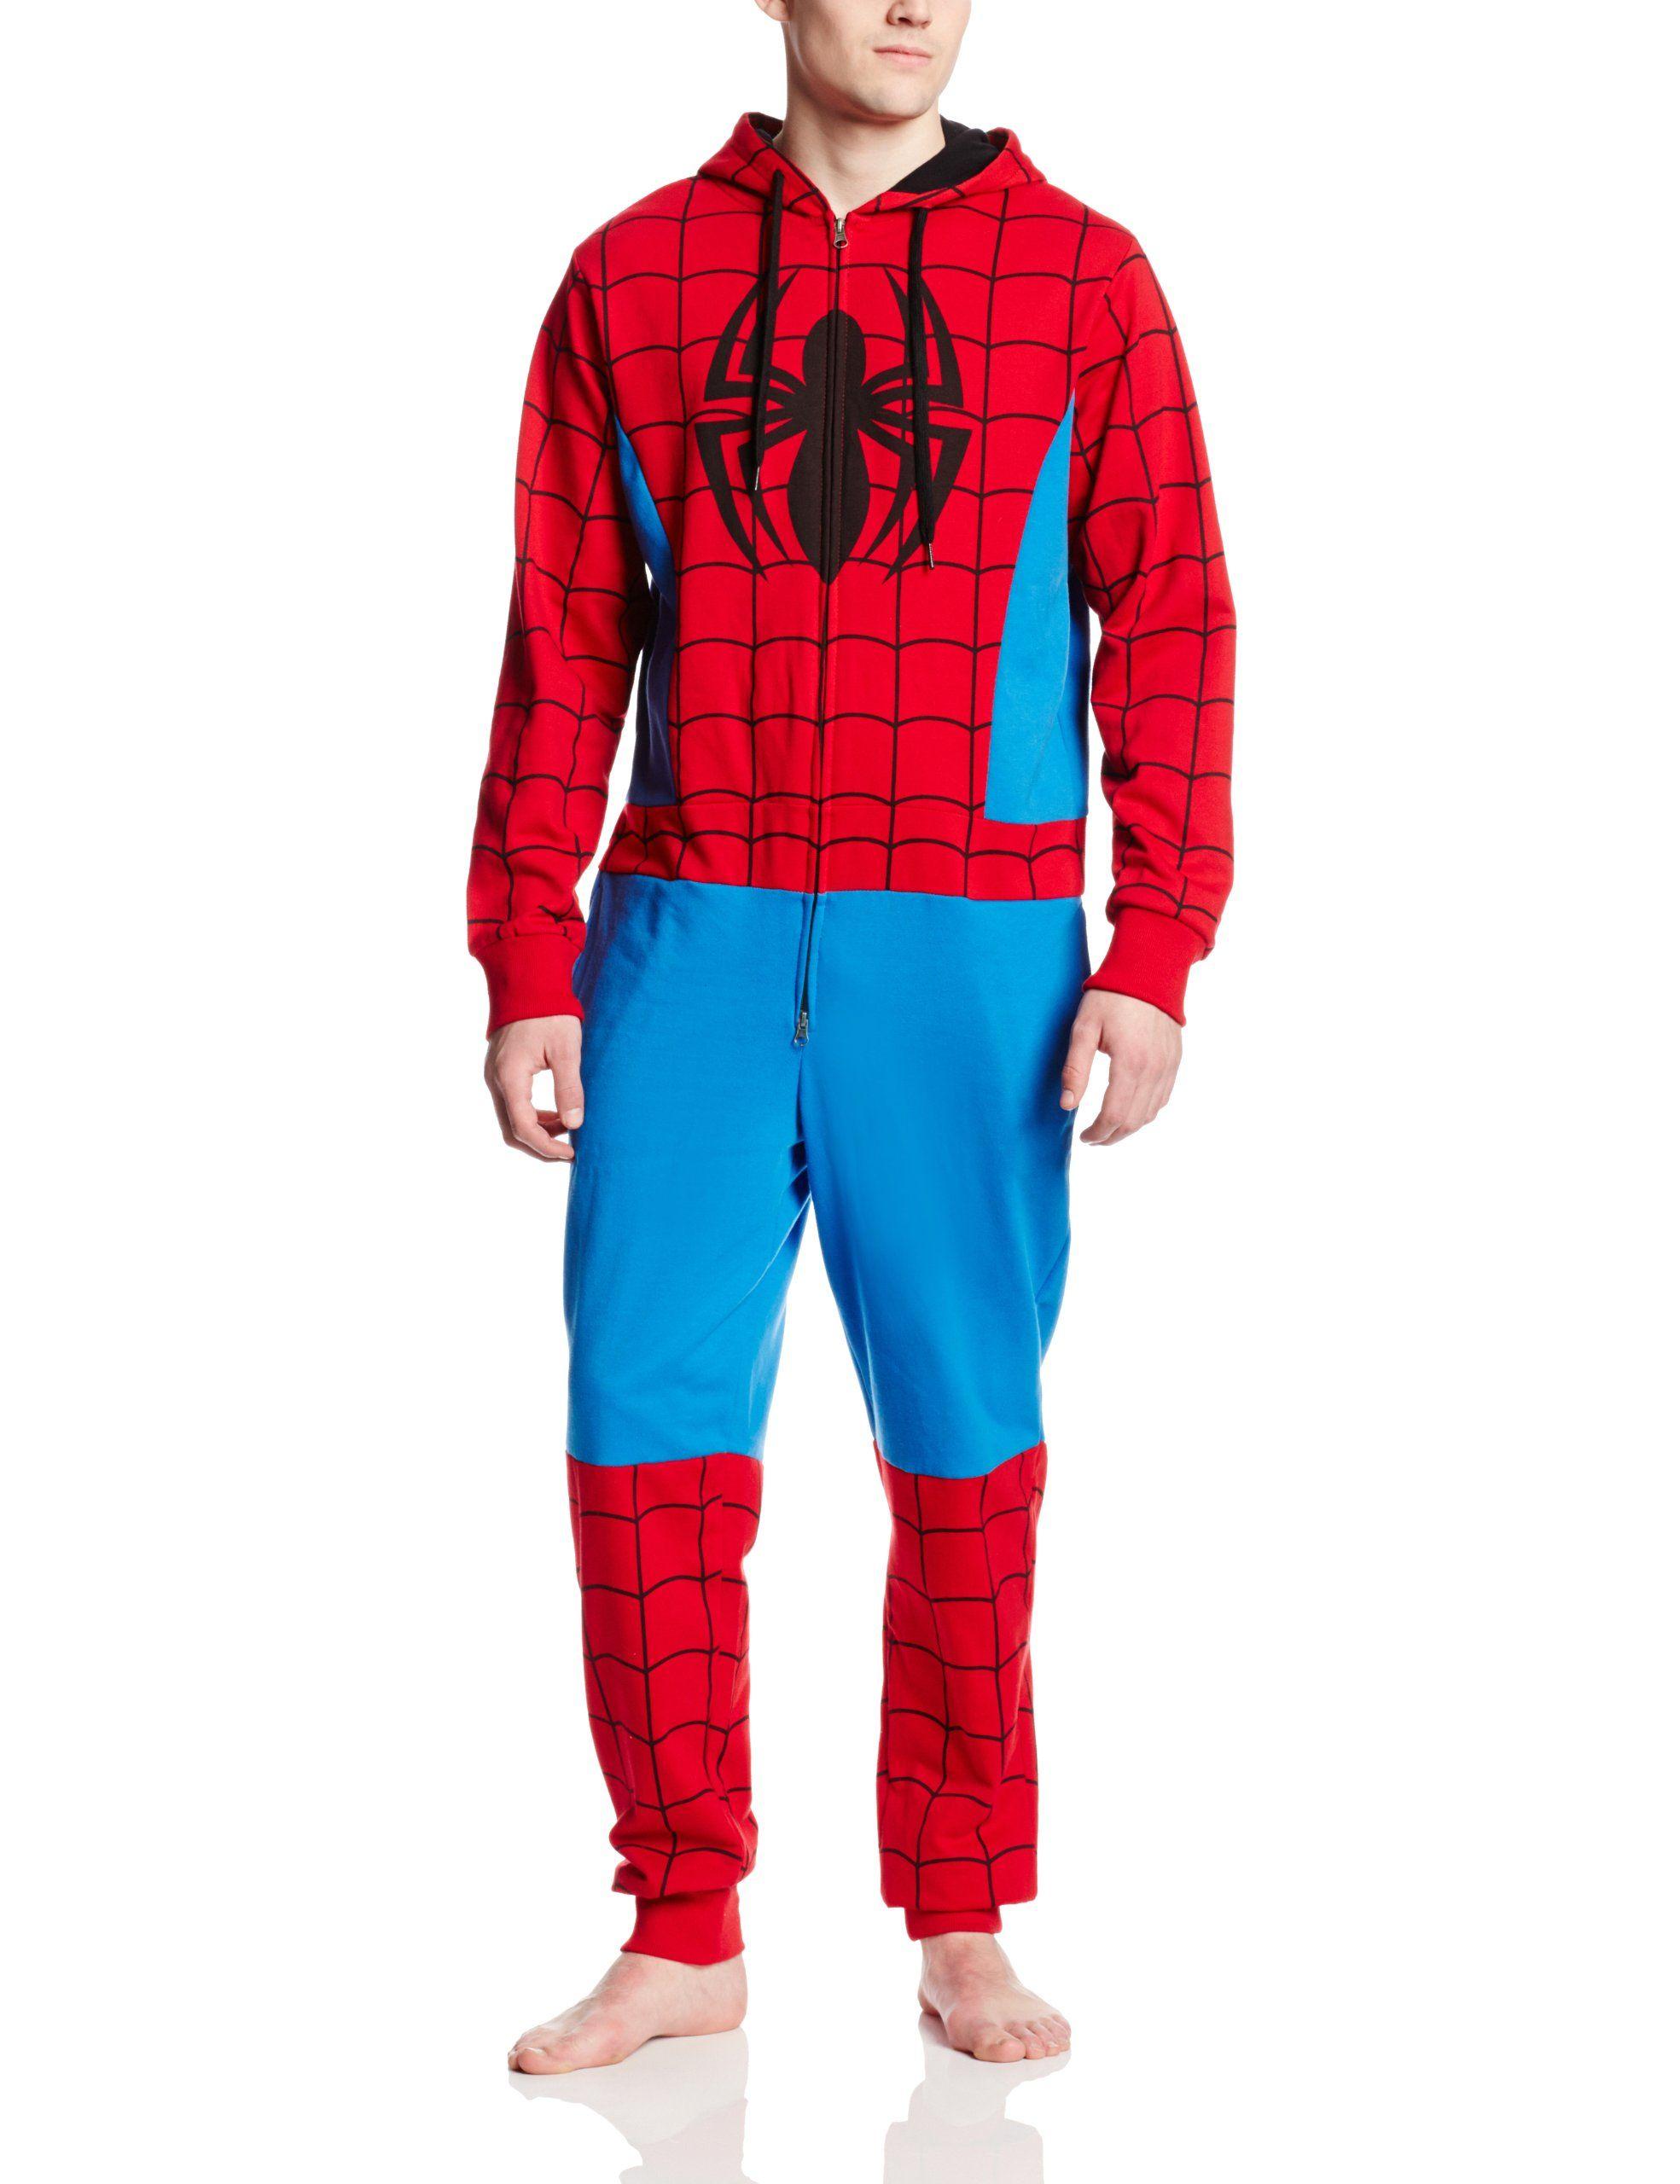 Marvel Men S Spidey Jumper Jumpsuits Royal Red Small Spiderman Hoodie Spiderman Man Hoodie Fashion [ 2560 x 1969 Pixel ]